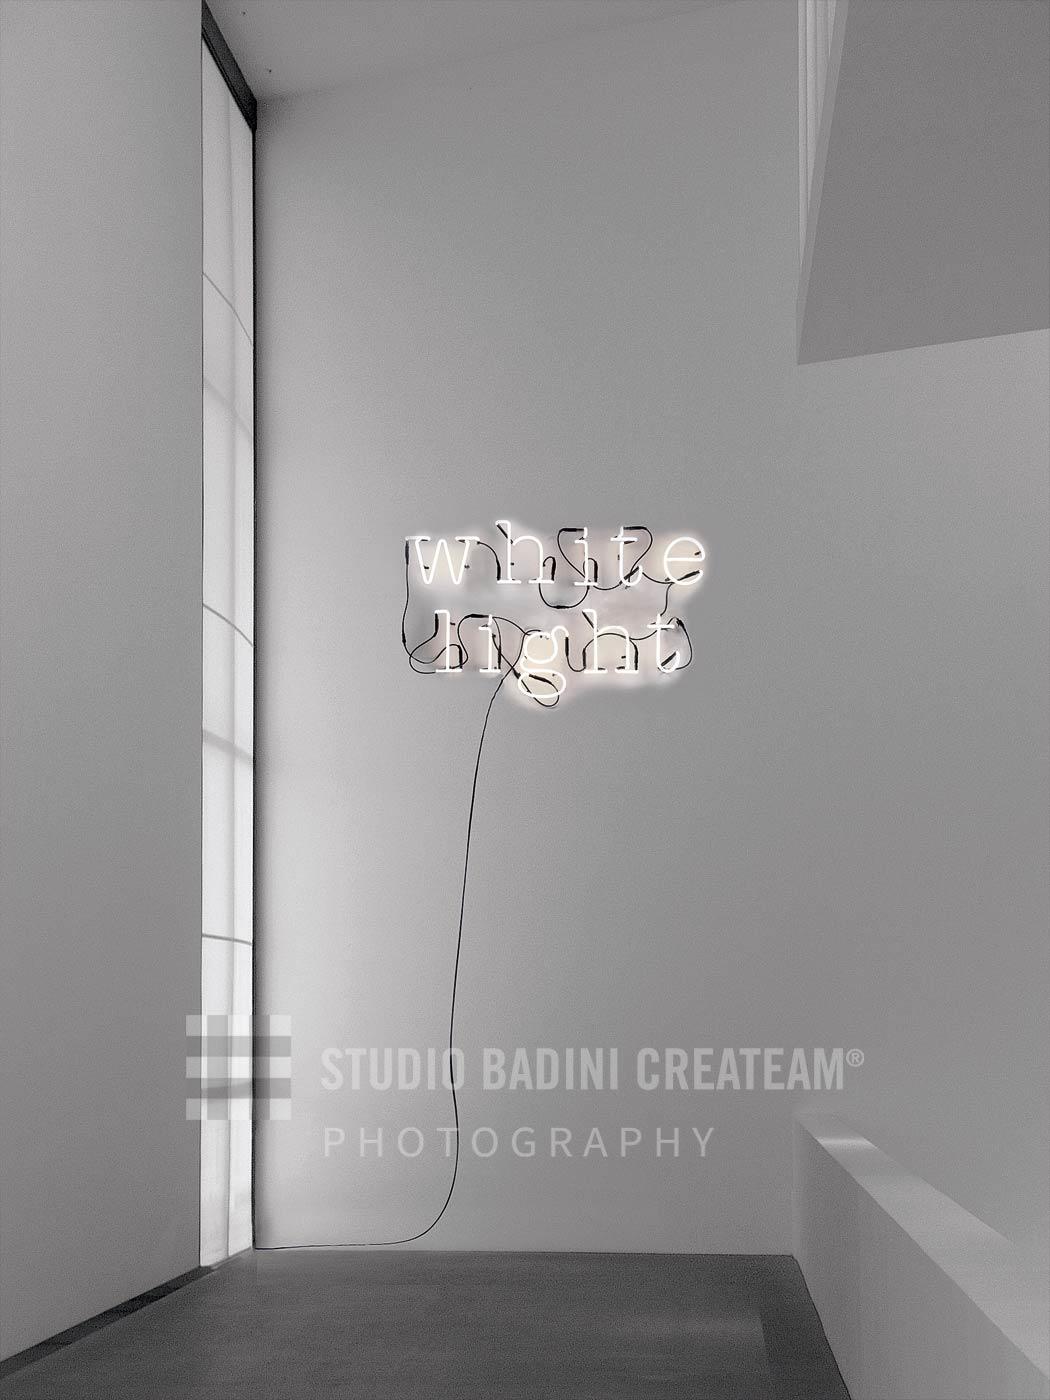 Badini Creative Studio - fotografia - seletti - whitelight